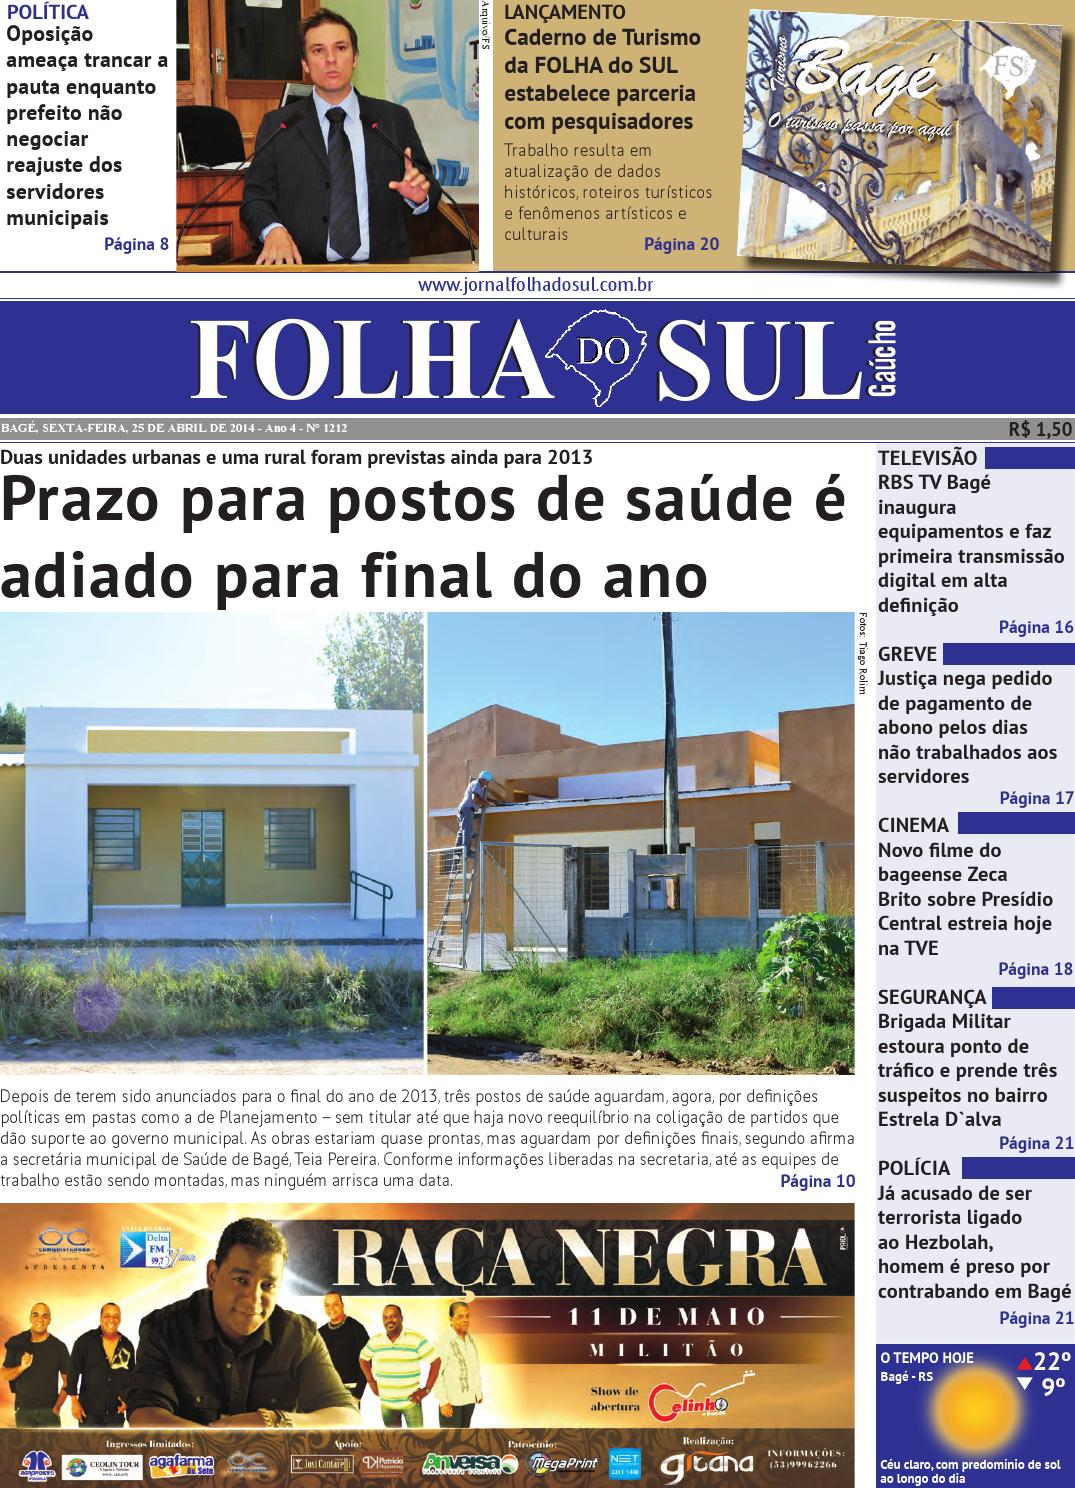 Folha do Sul Gaúcho Ed. 1212 (25 04 2014) by Folha do Sul Gaúcho - issuu 847d91736019